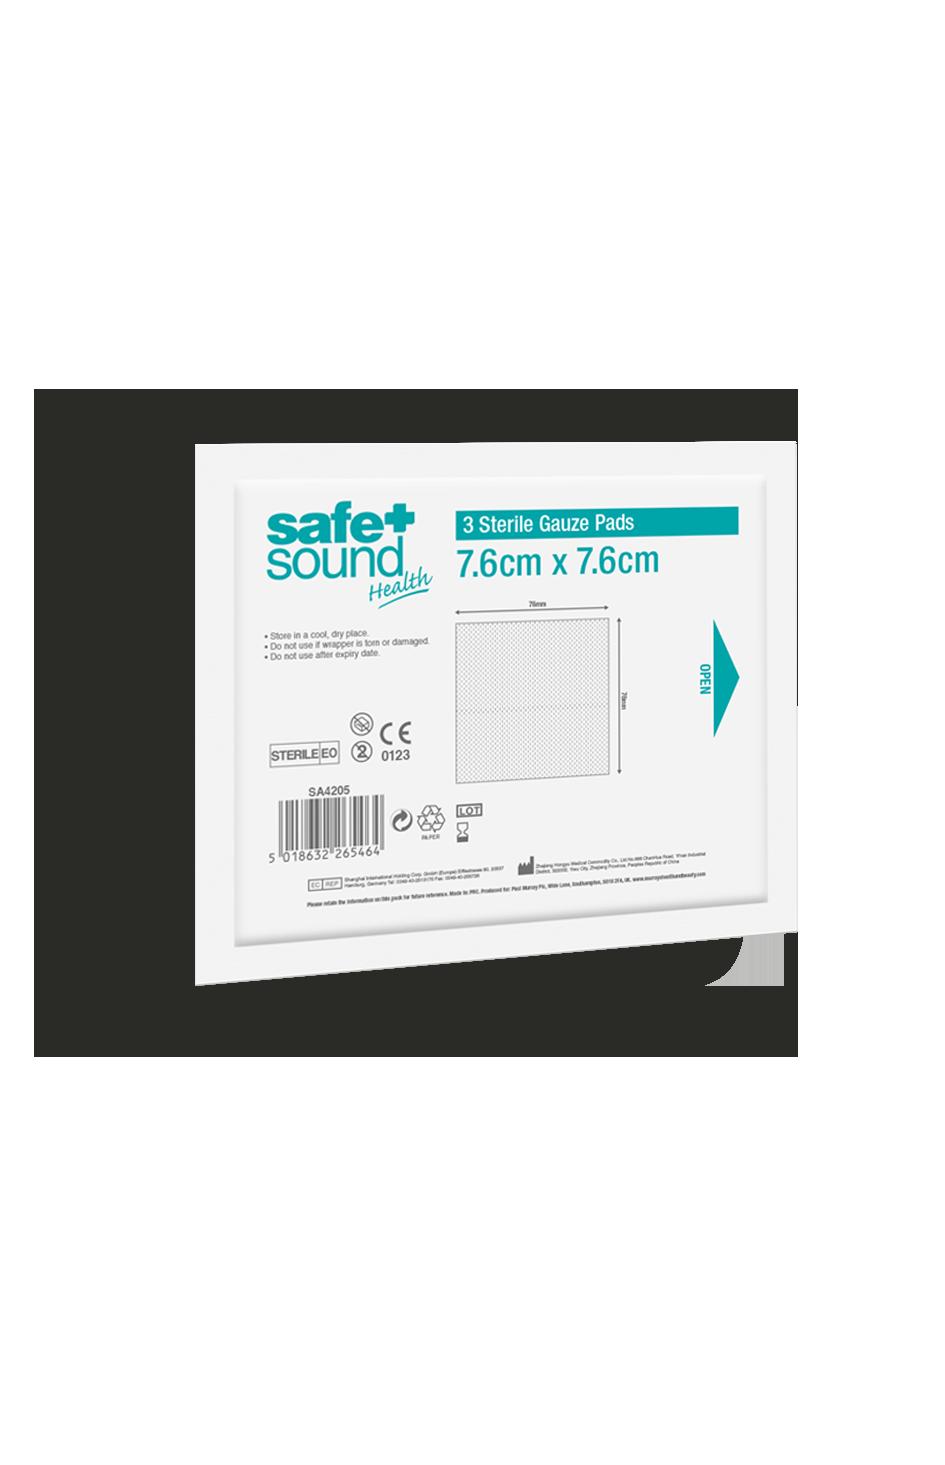 Safe and Sound Health Gauze Pads 7.6 x 7.6